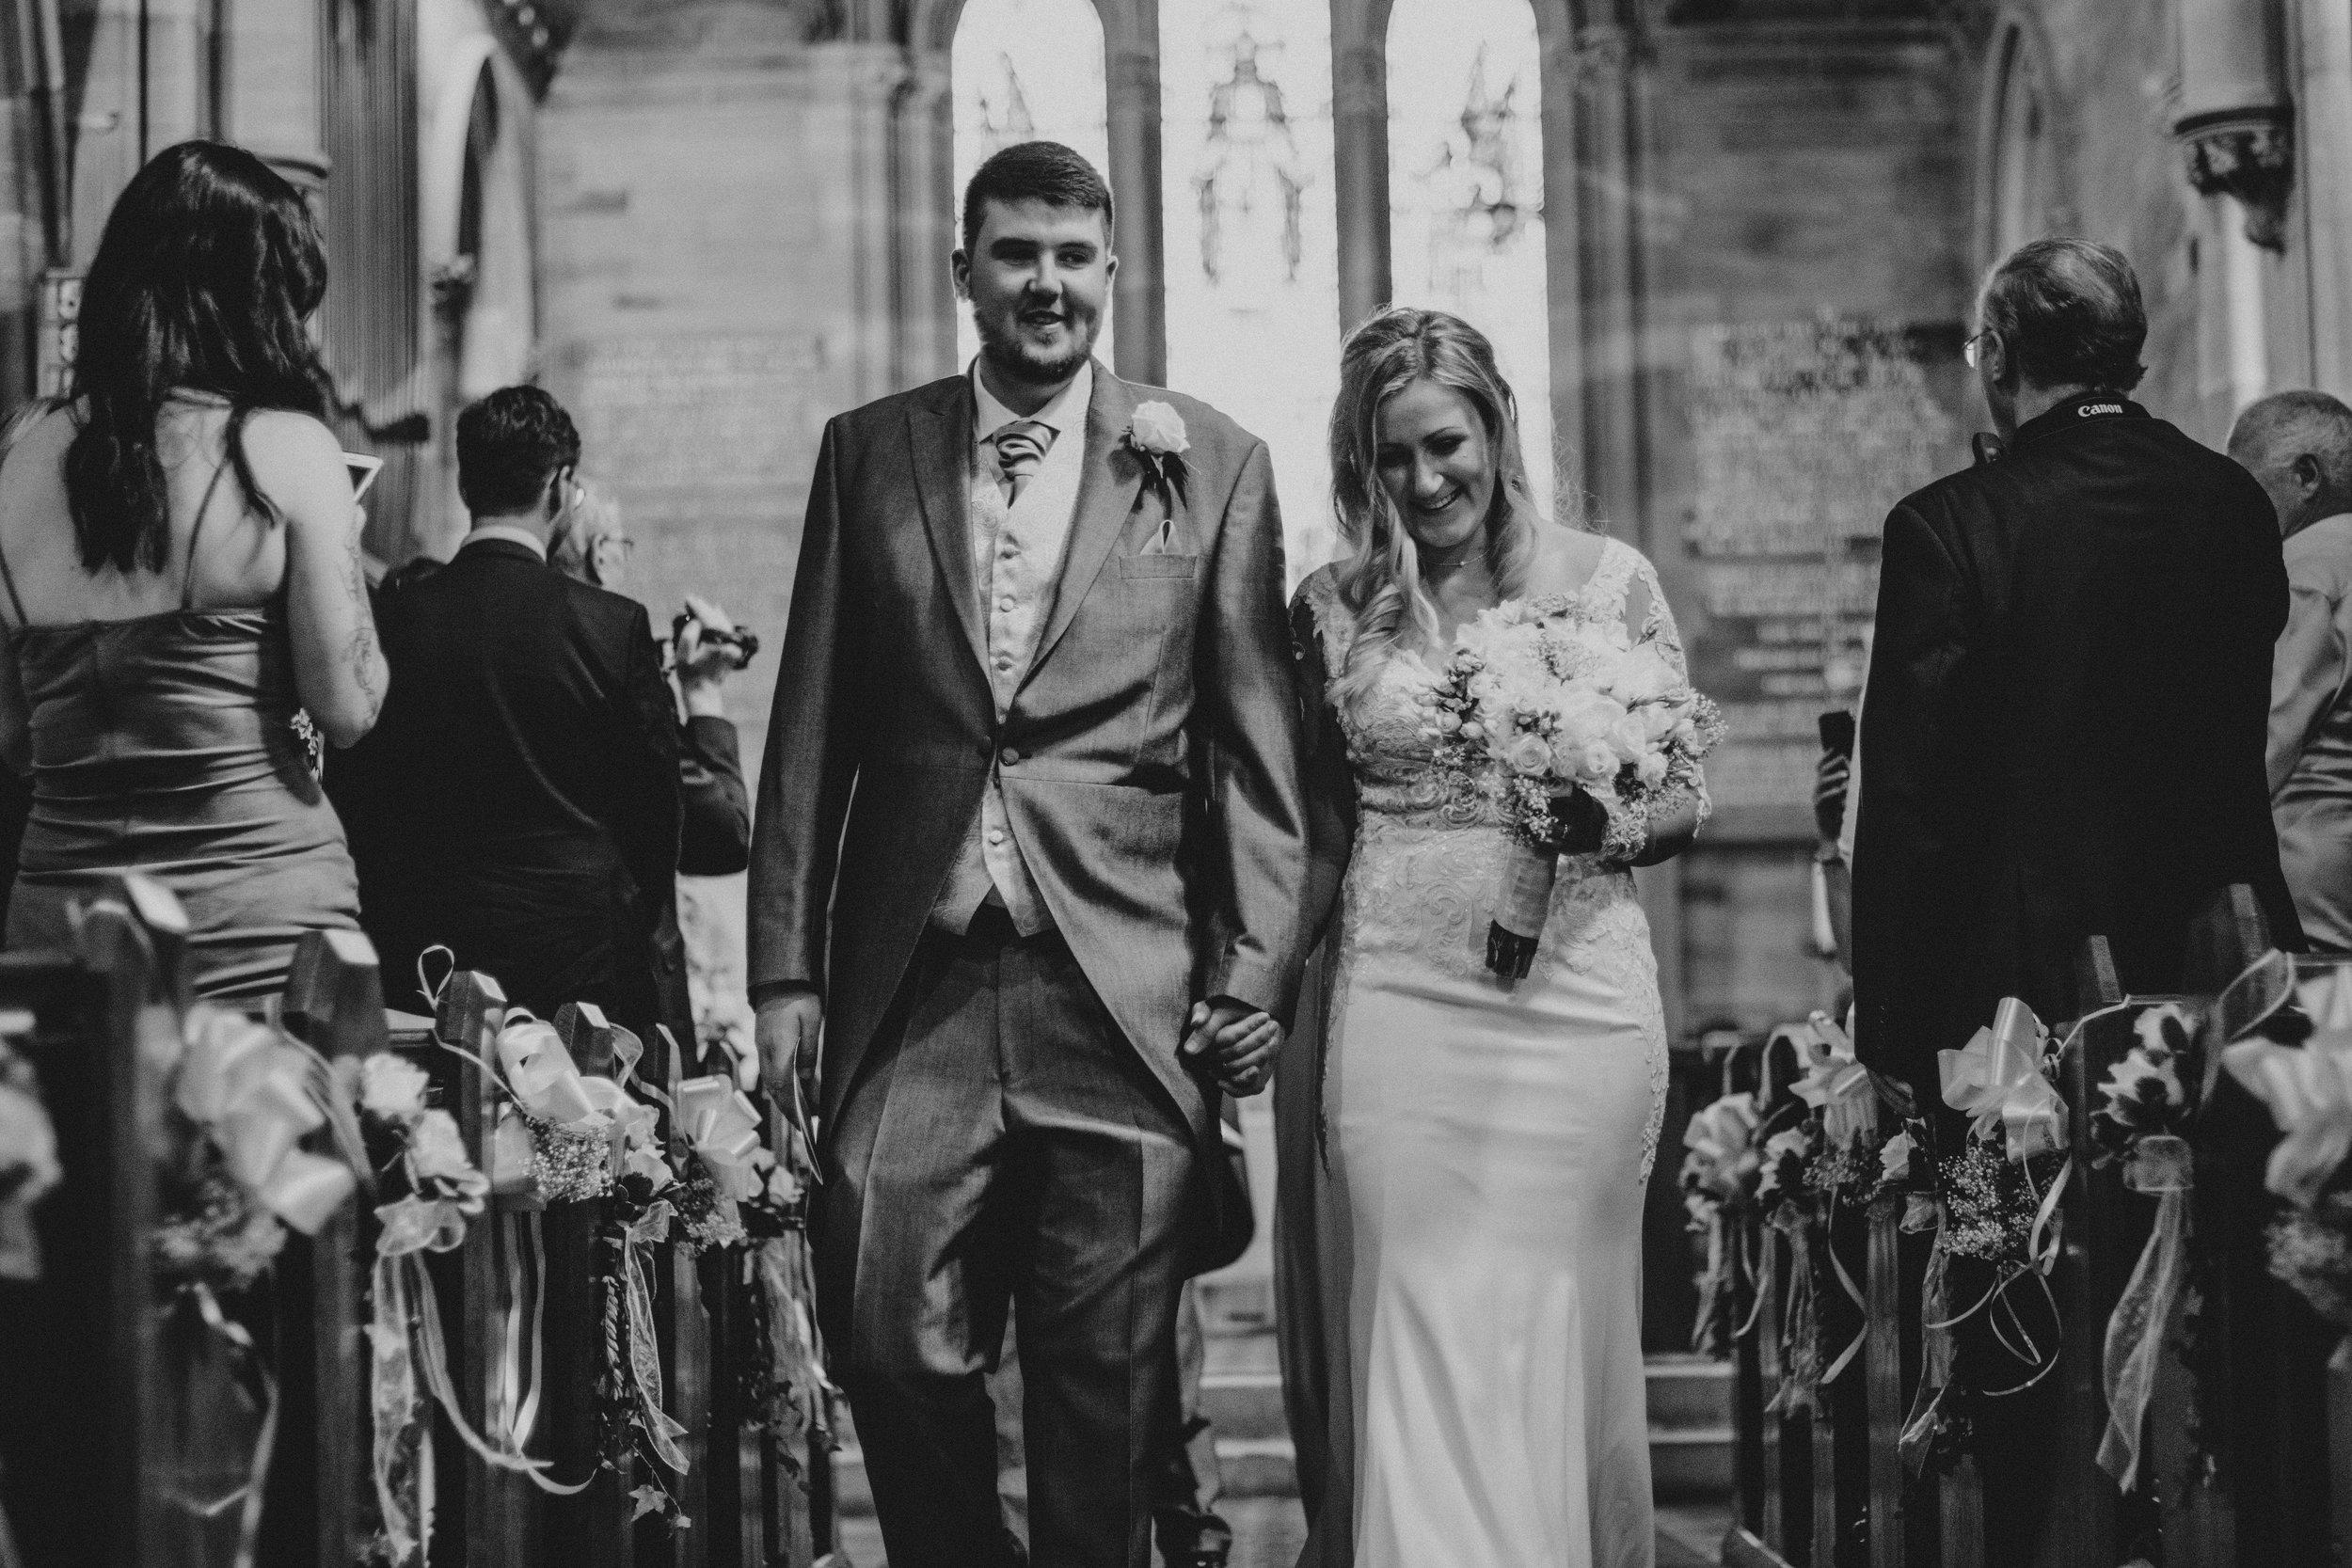 Cheshire wedding Photographer wedding photographer engagement photographer carlisle wedding photographer edinburgh wedding photographer rome wedding photographer (1 of 1)-2.jpg